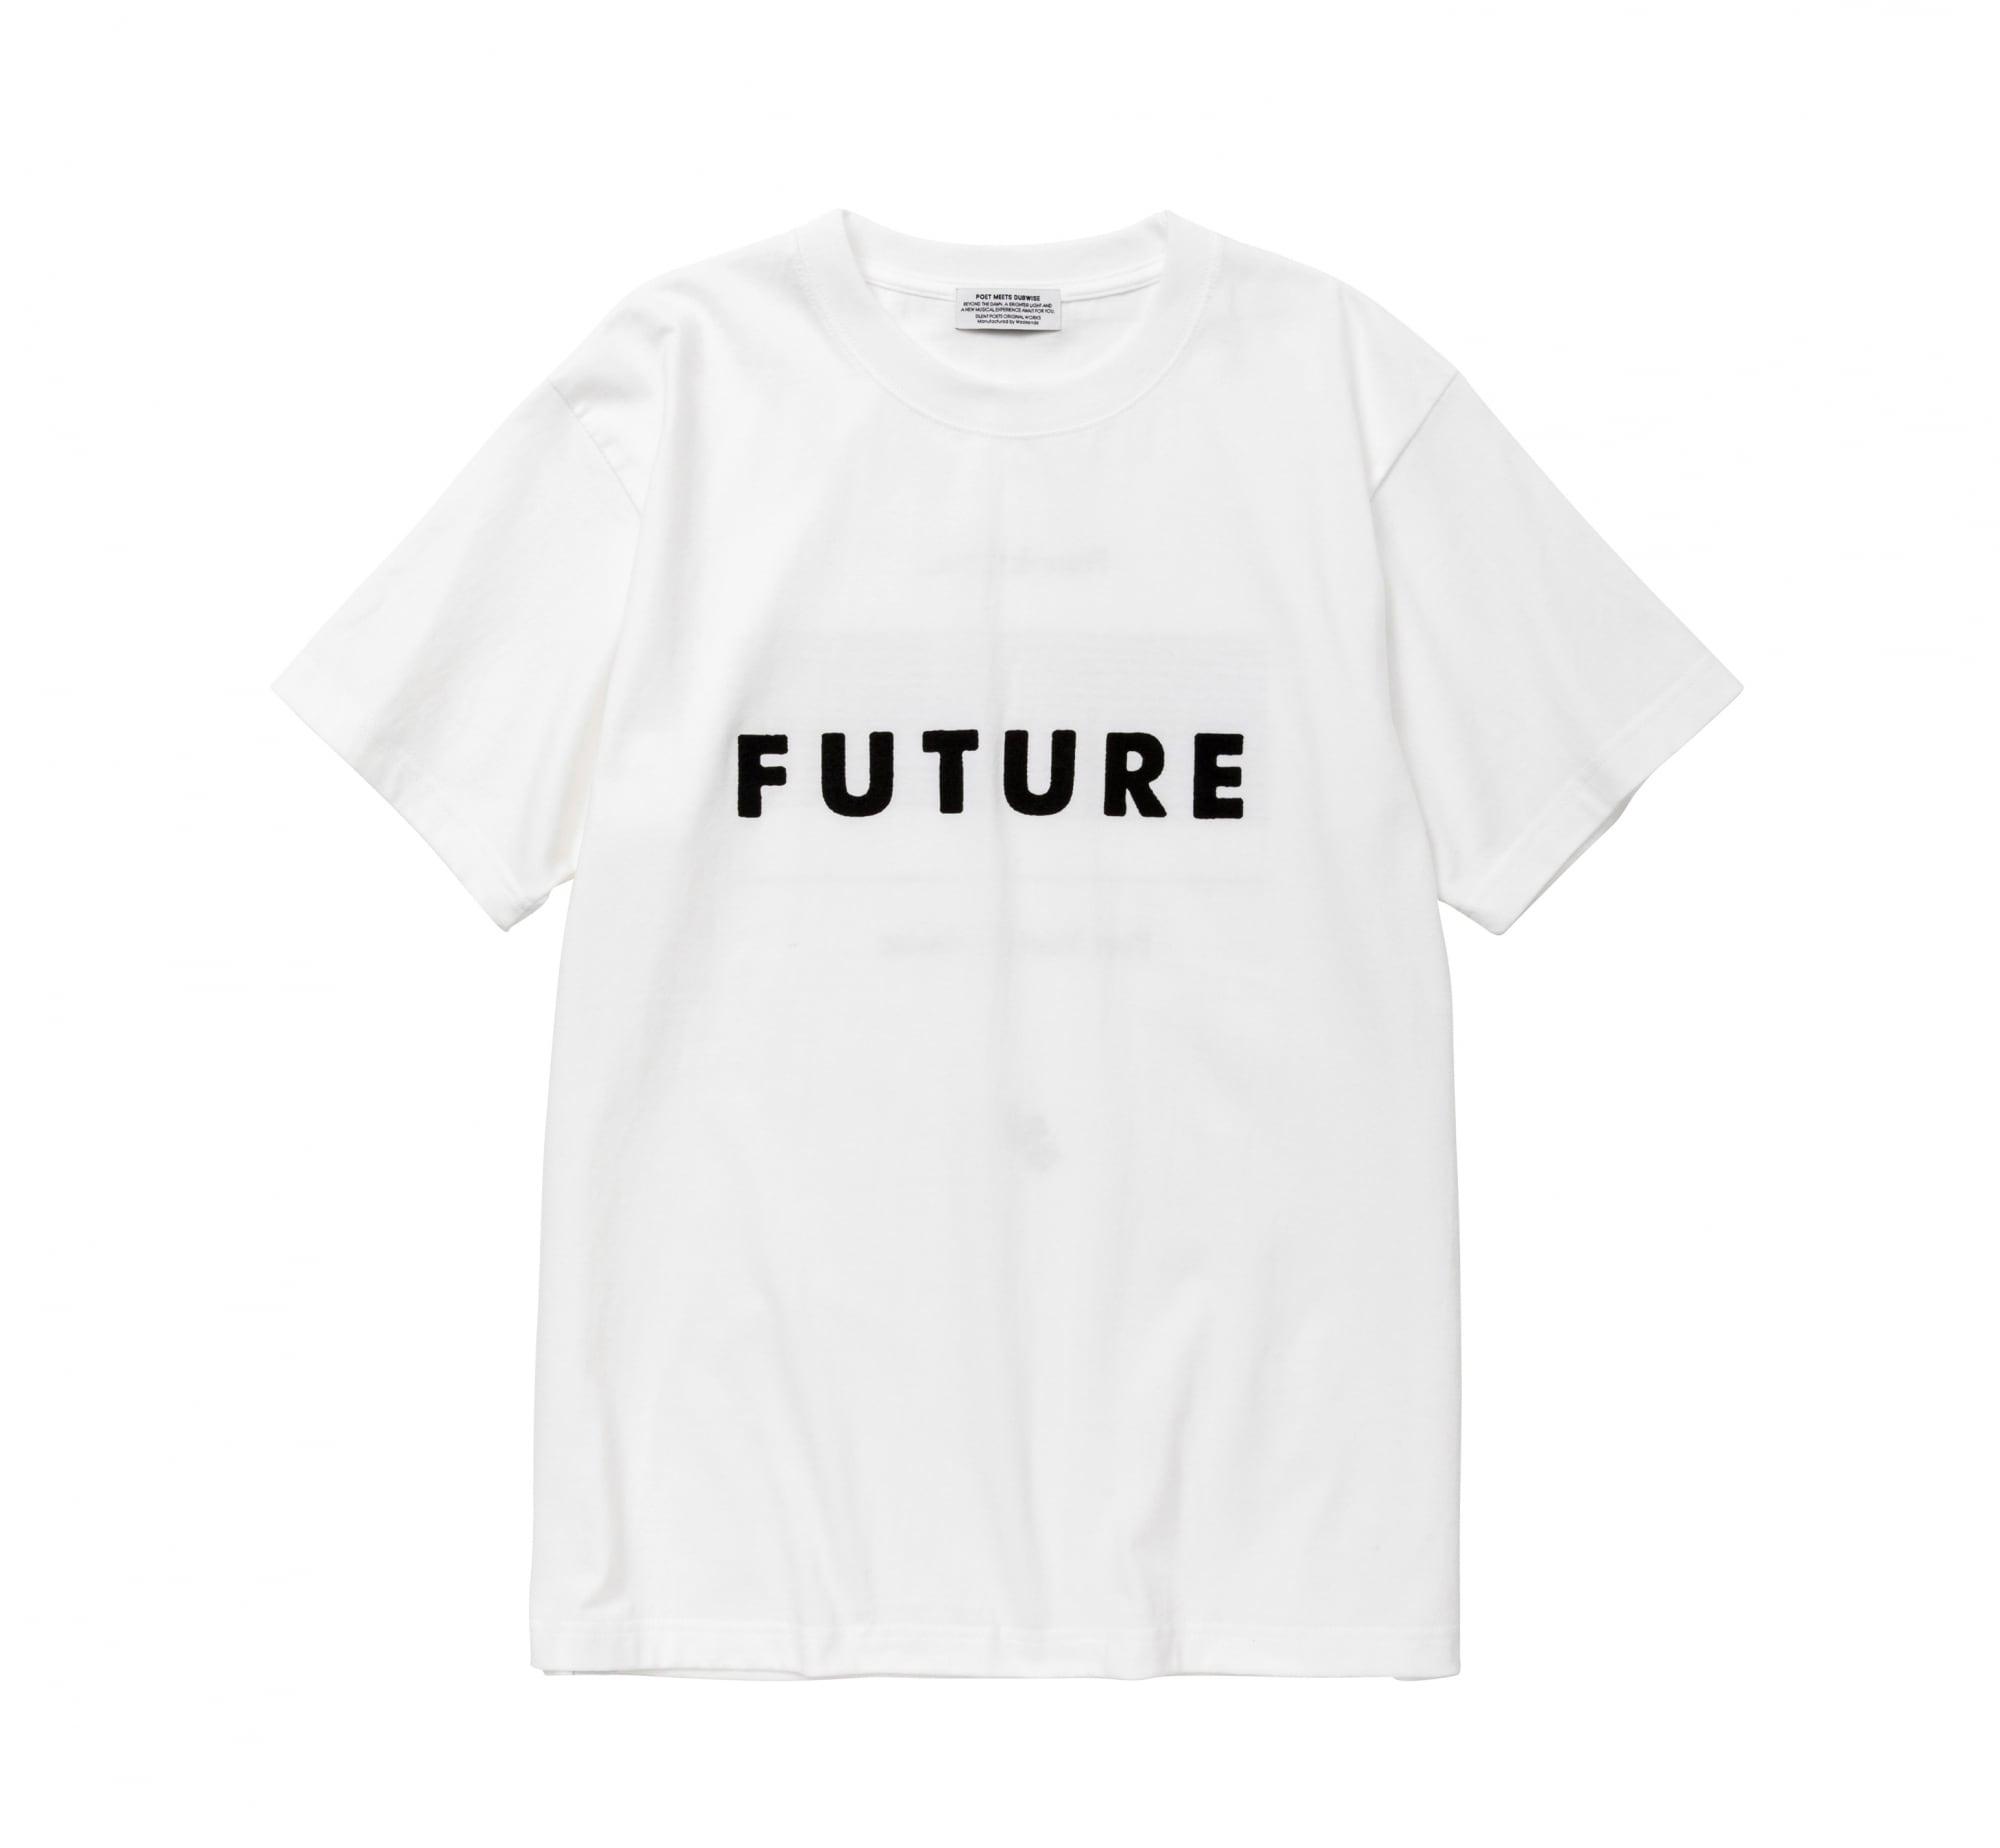 【40% OFF】POET MEETS DUBWISE / LOGO TEE(FUTURE)